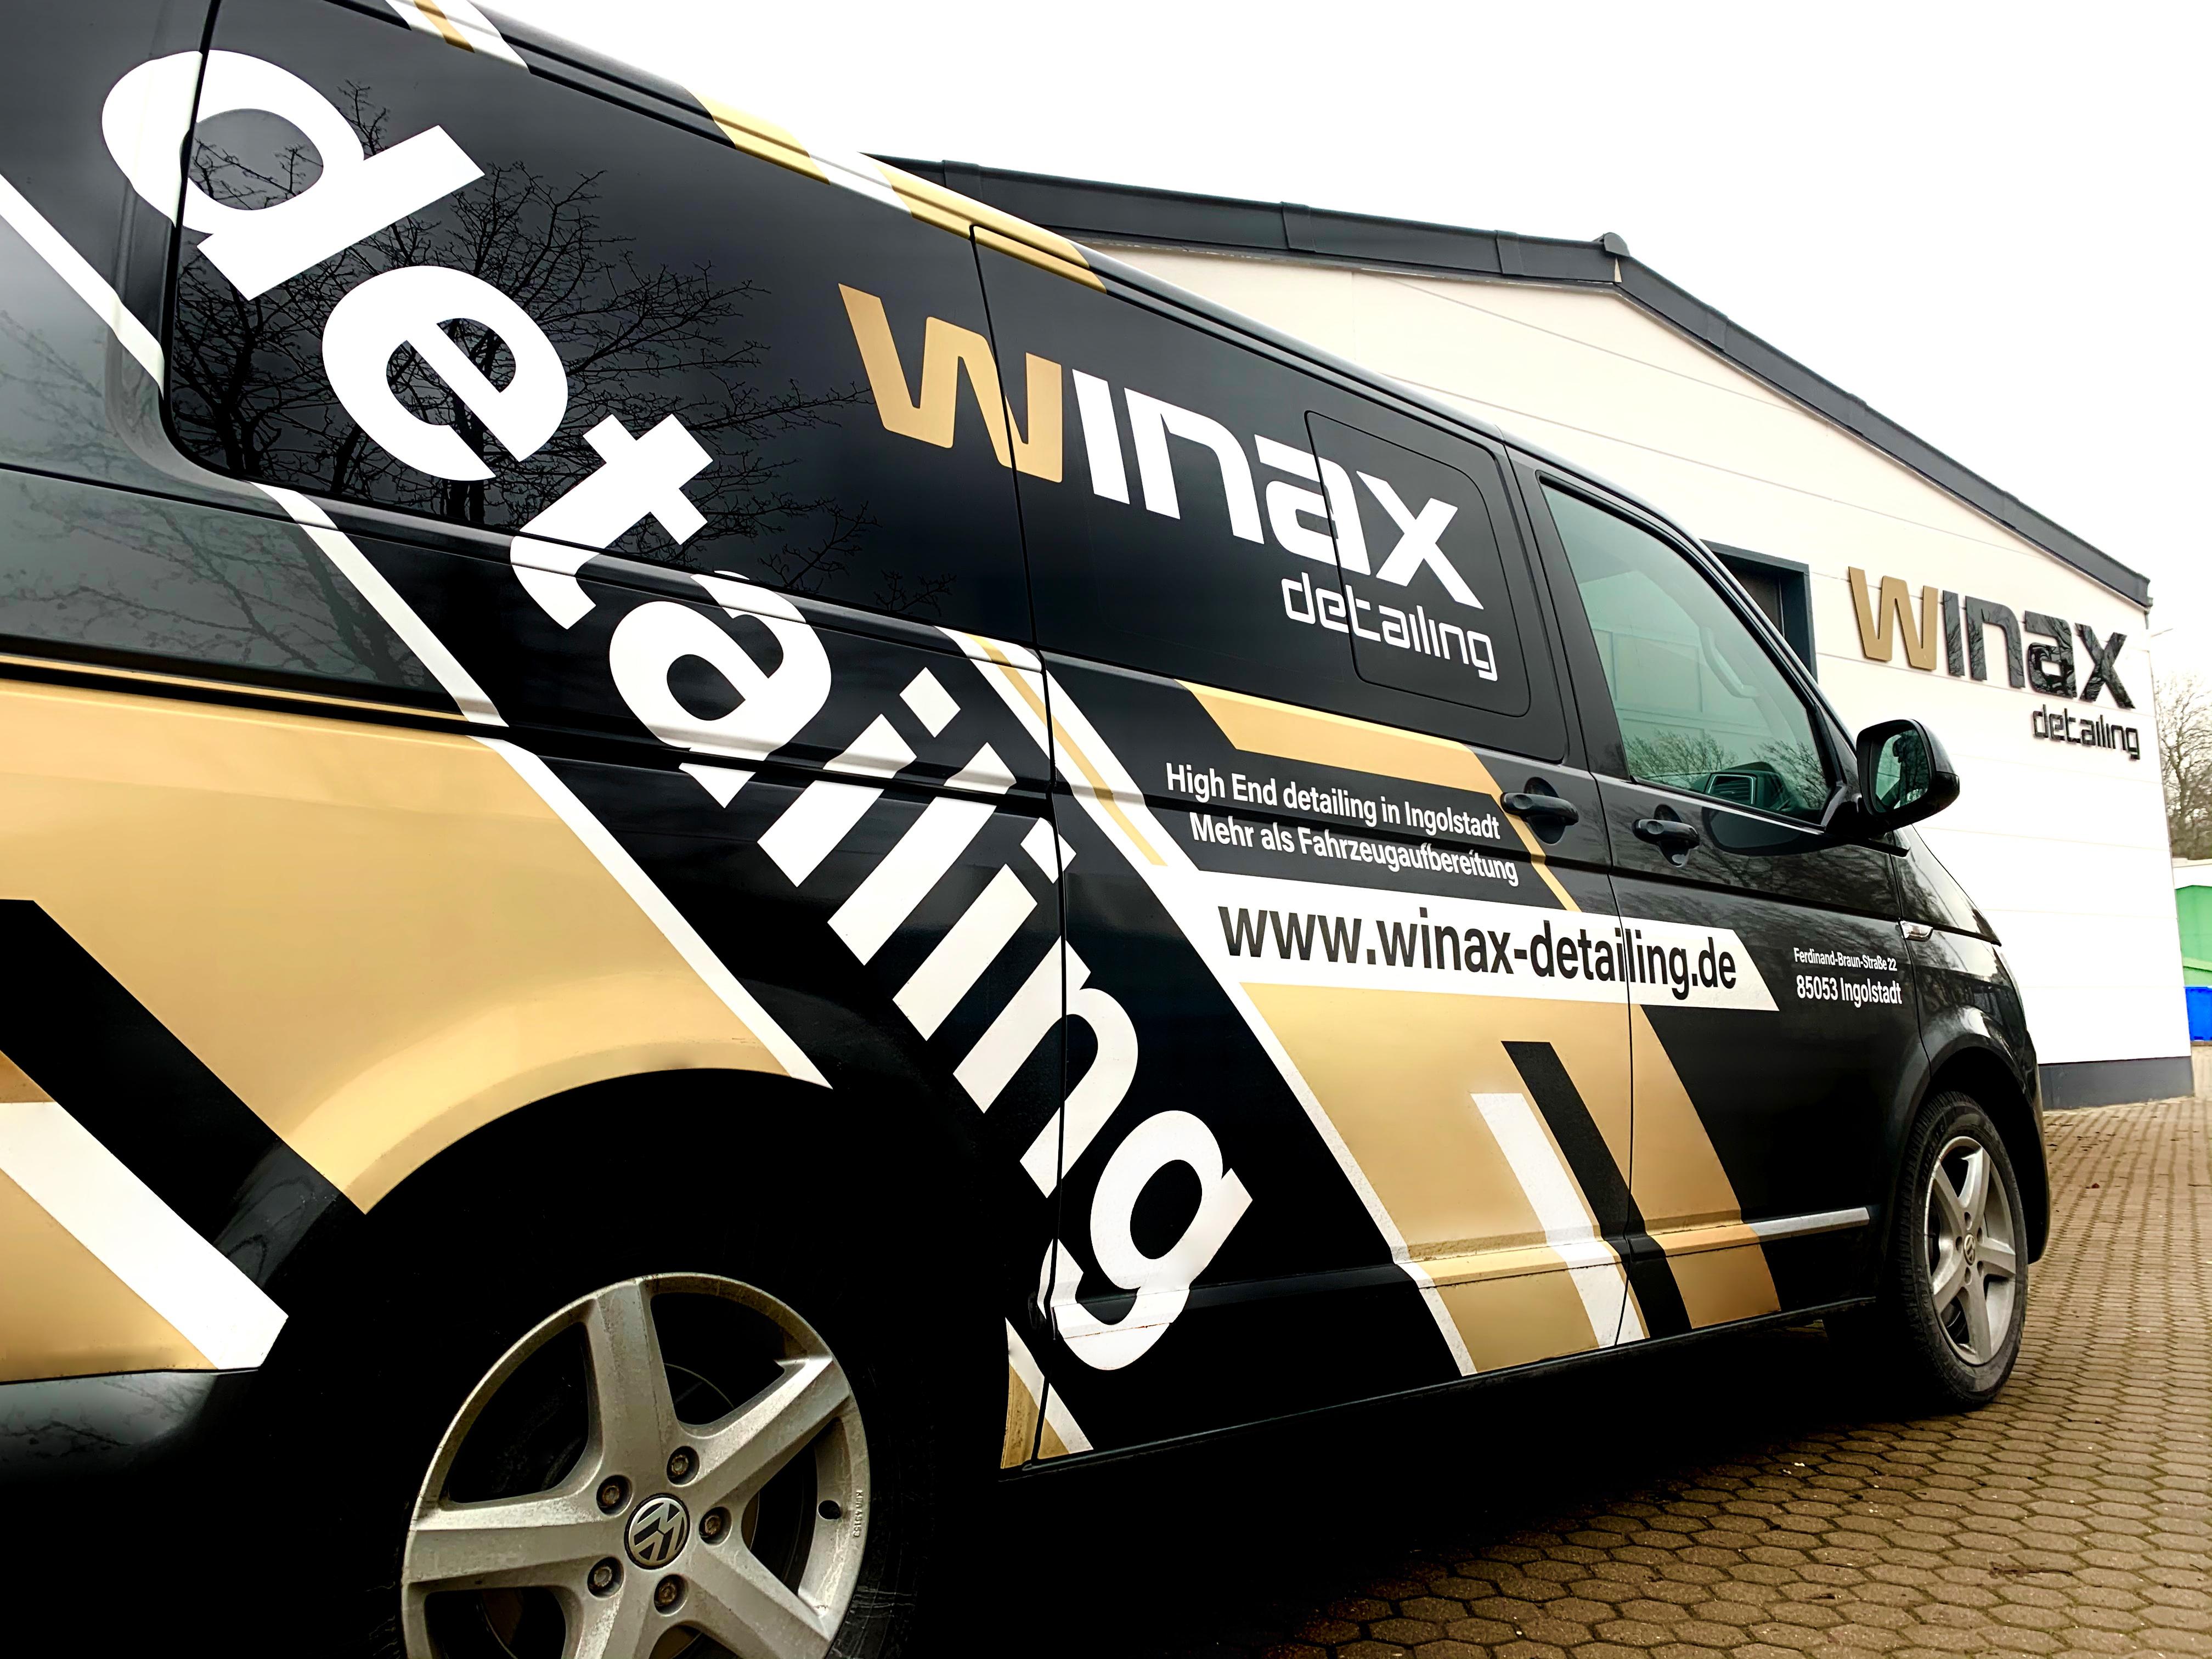 Fahrzeuggestaltung, winax detailing – Flott unterwegs